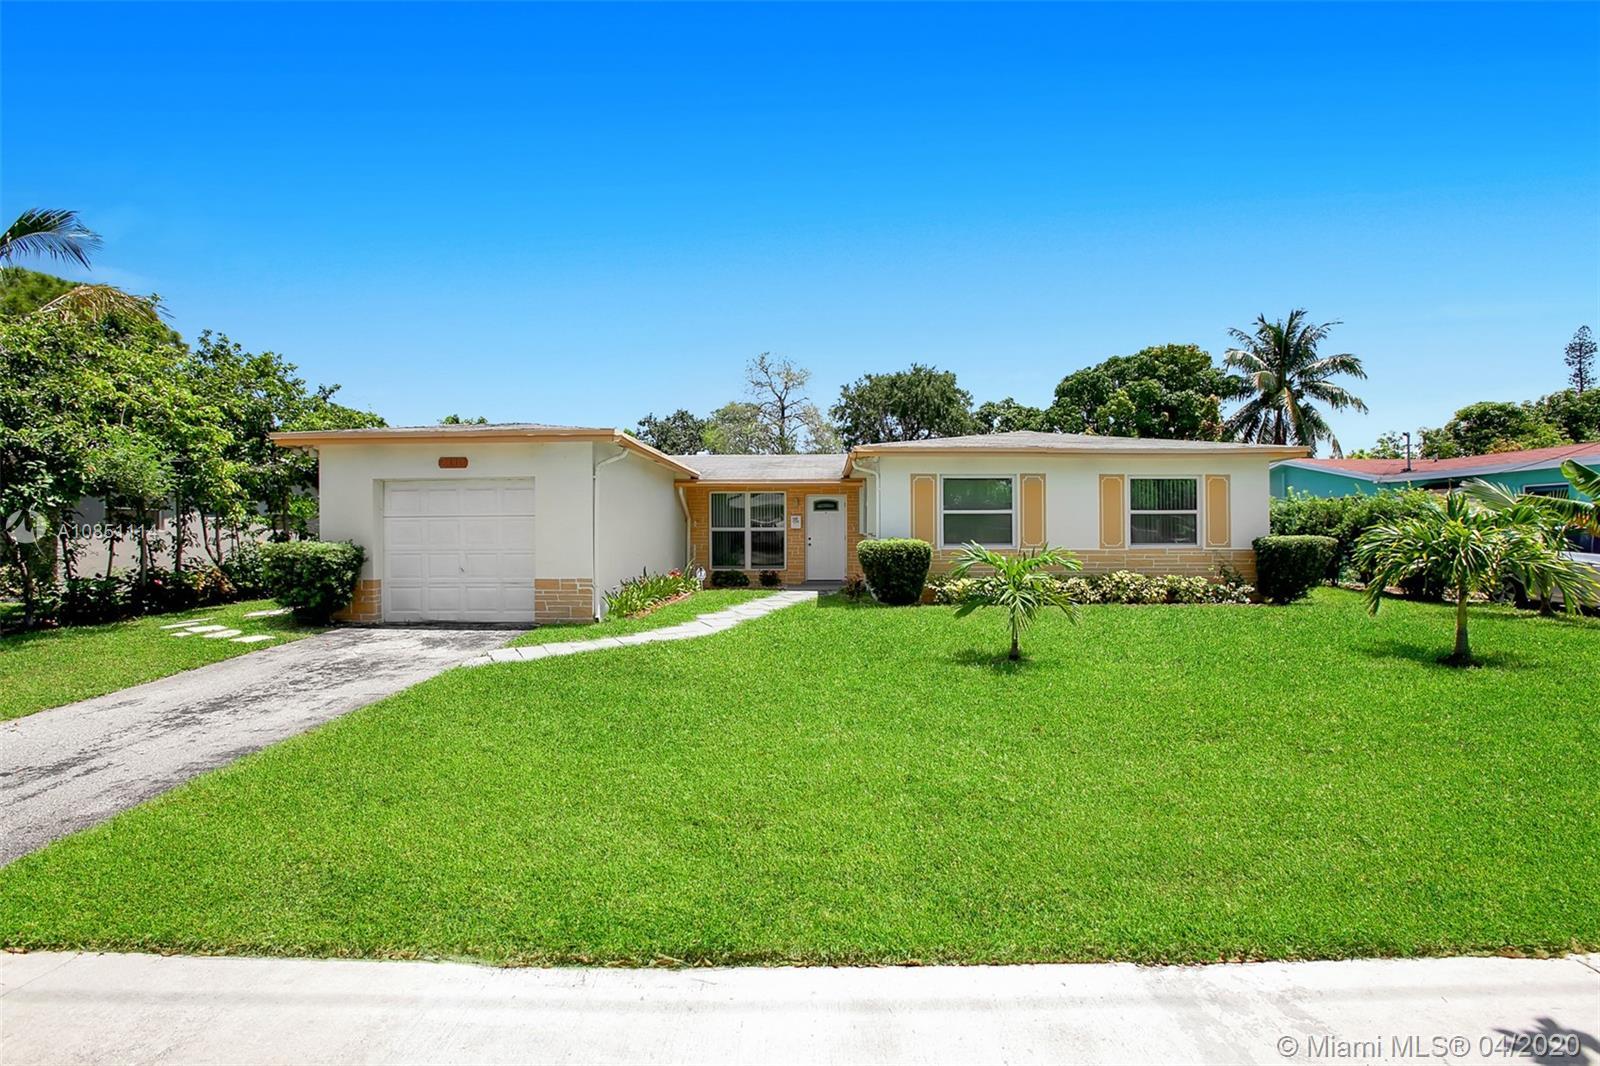 2330 NW 47th Ave, Lauderhill, FL 33313